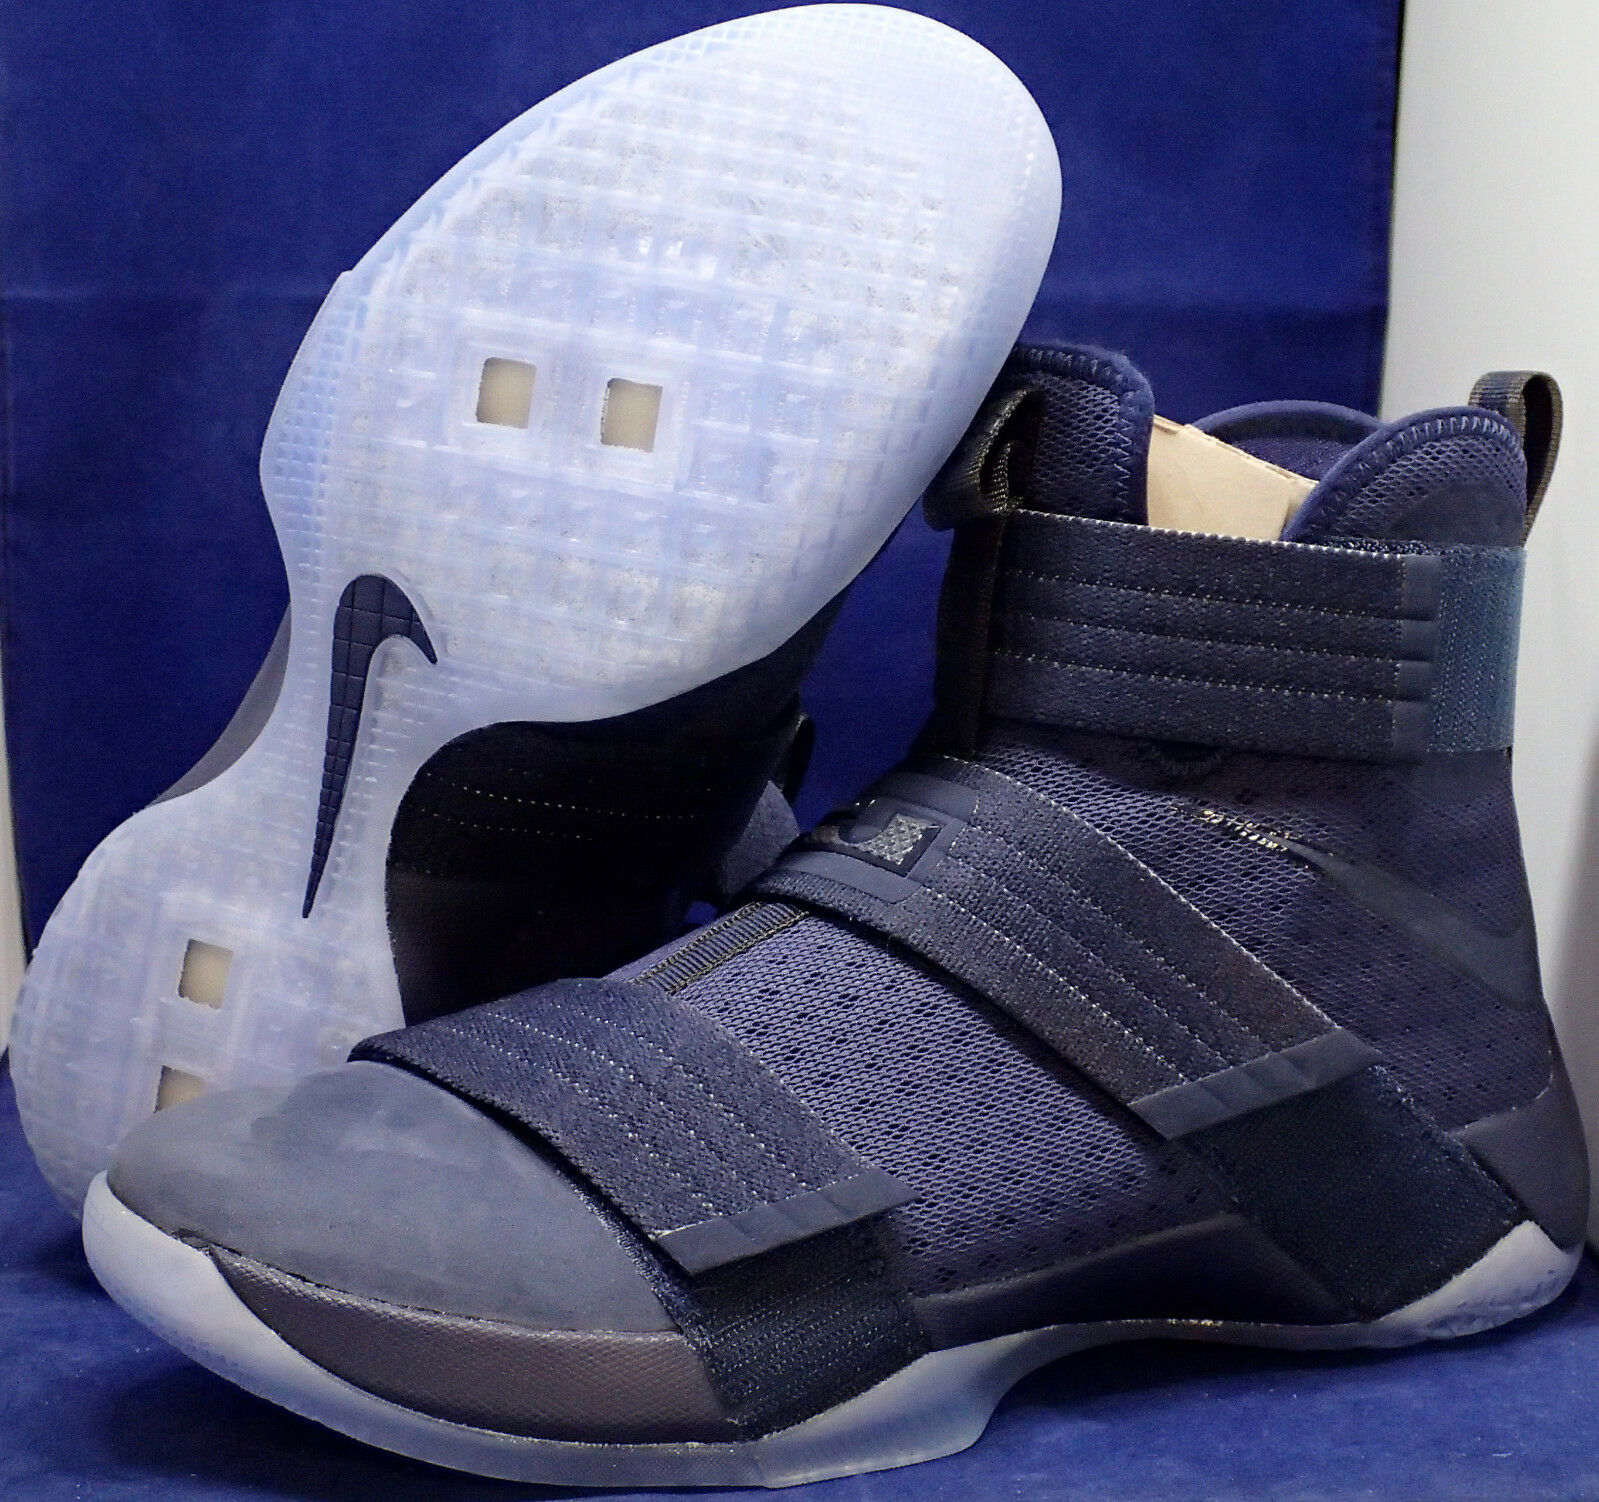 Nike Lebron Soldier 10 X SFG Midnight Navy SZ 10.5 ( 844378-444 )